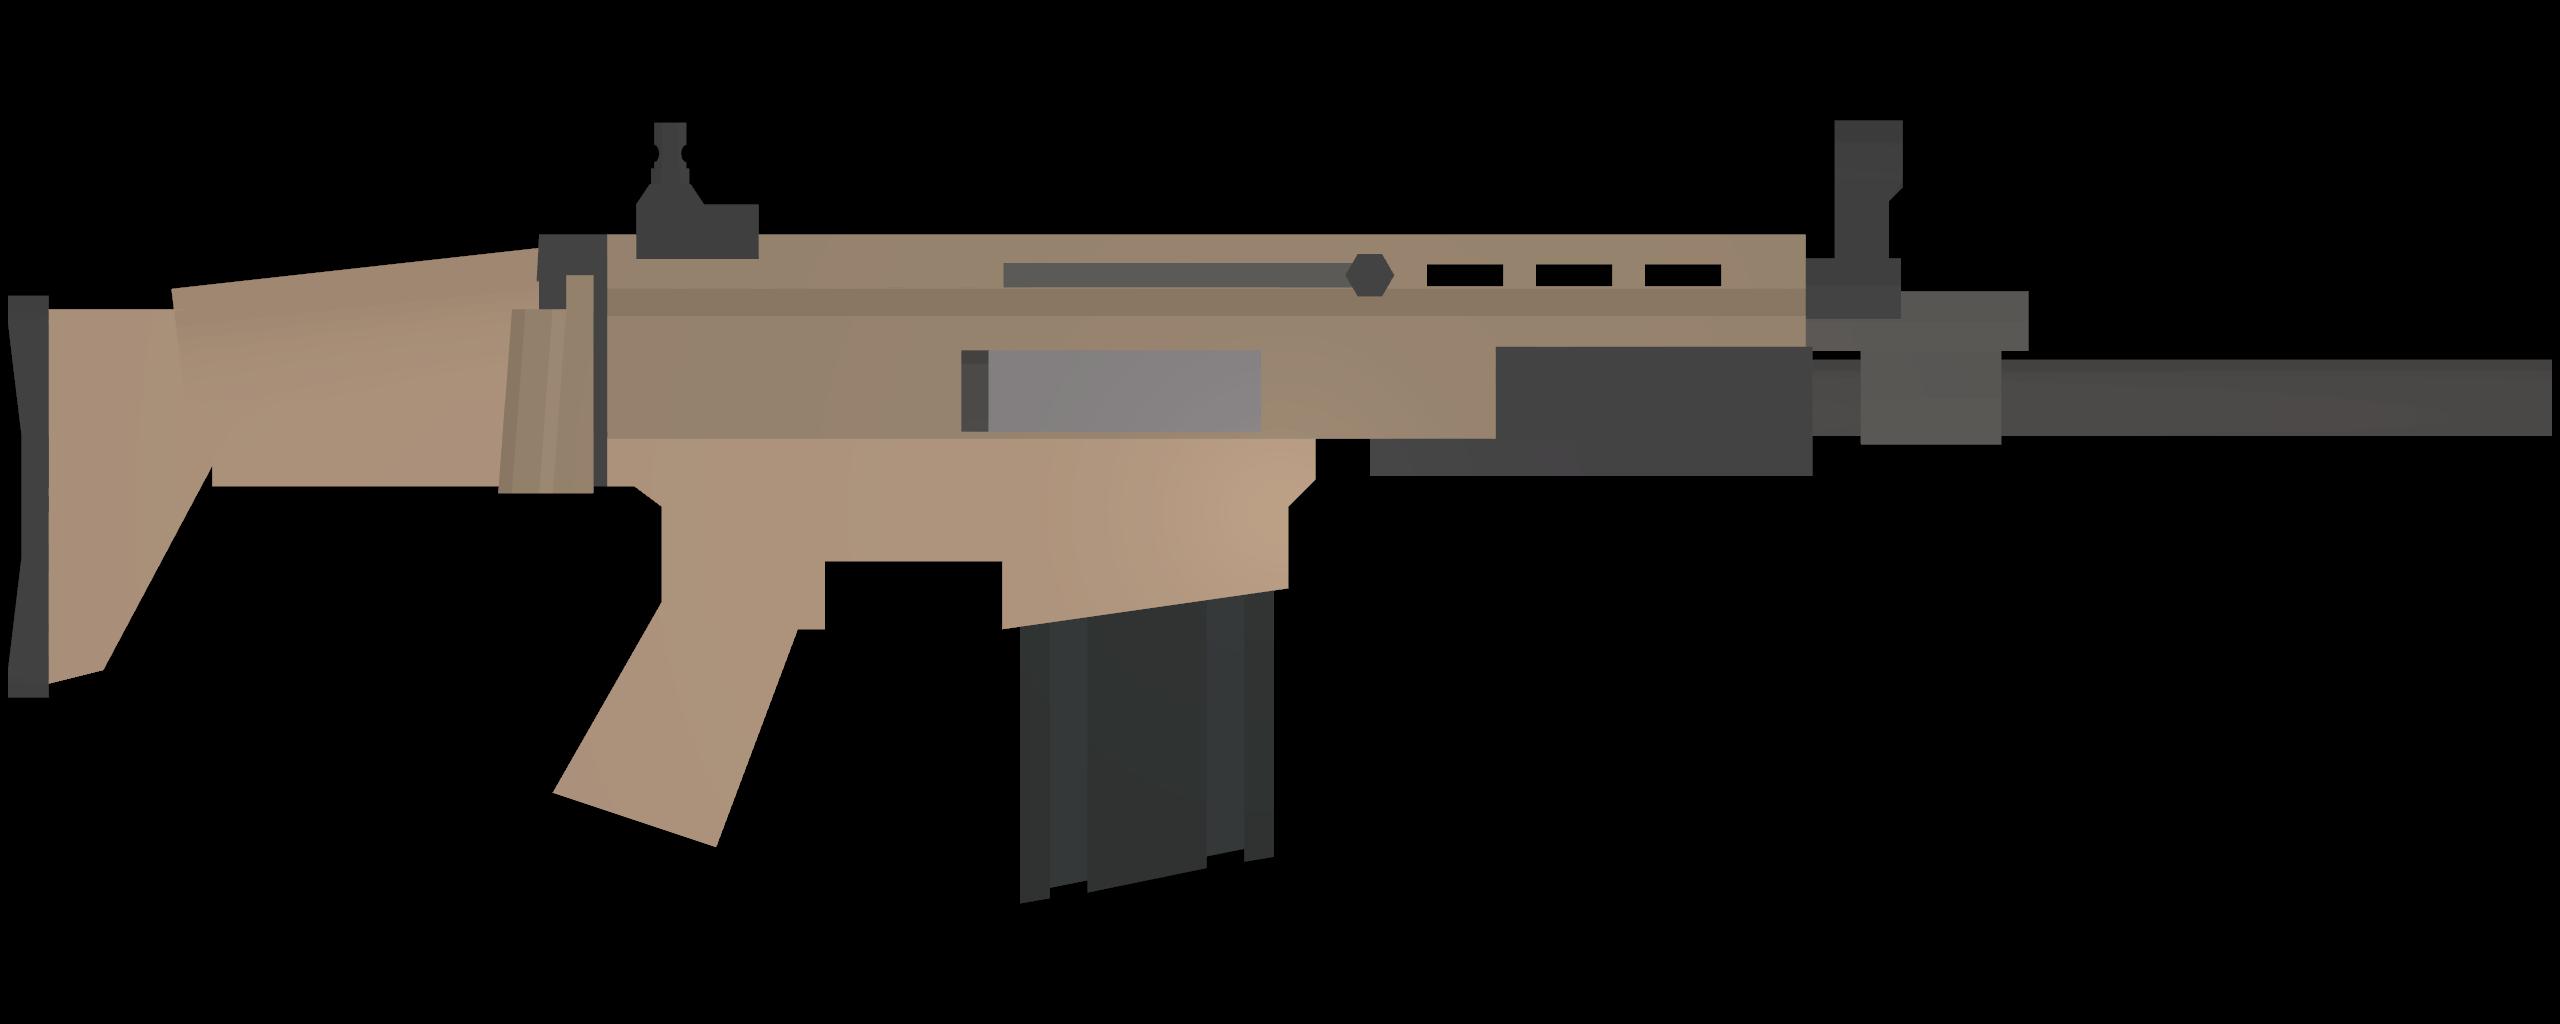 Unturned Uncreated Warfare Mods & All ID List + Attachments - USA Weapons - 4FD3E7B